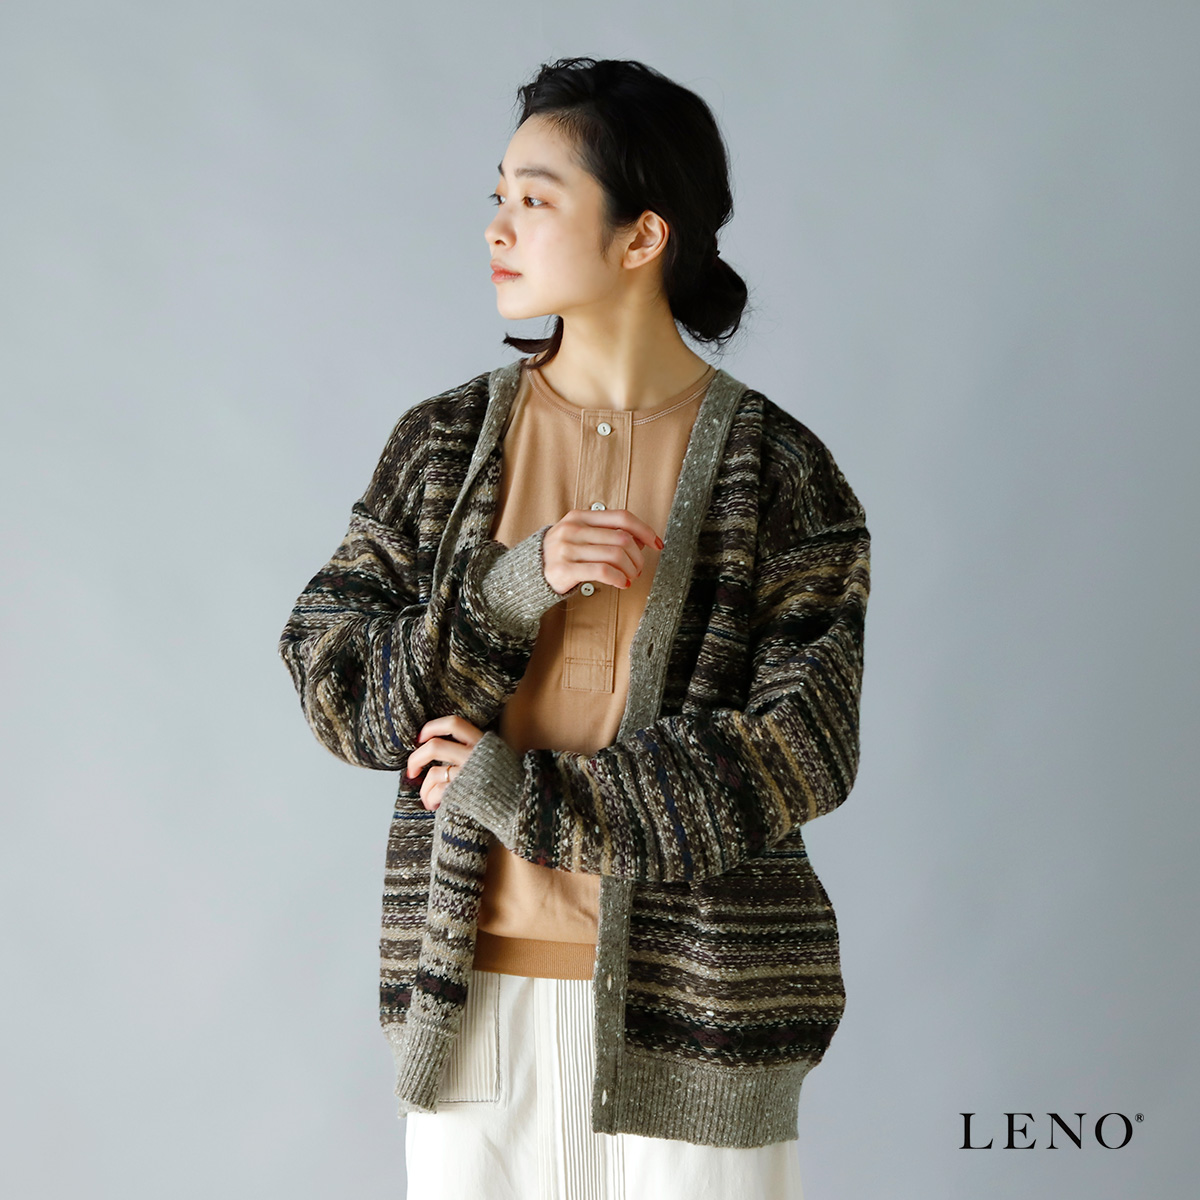 LENO(リノ)ジャガードマルチボーダーニットカーディガン leno-k005